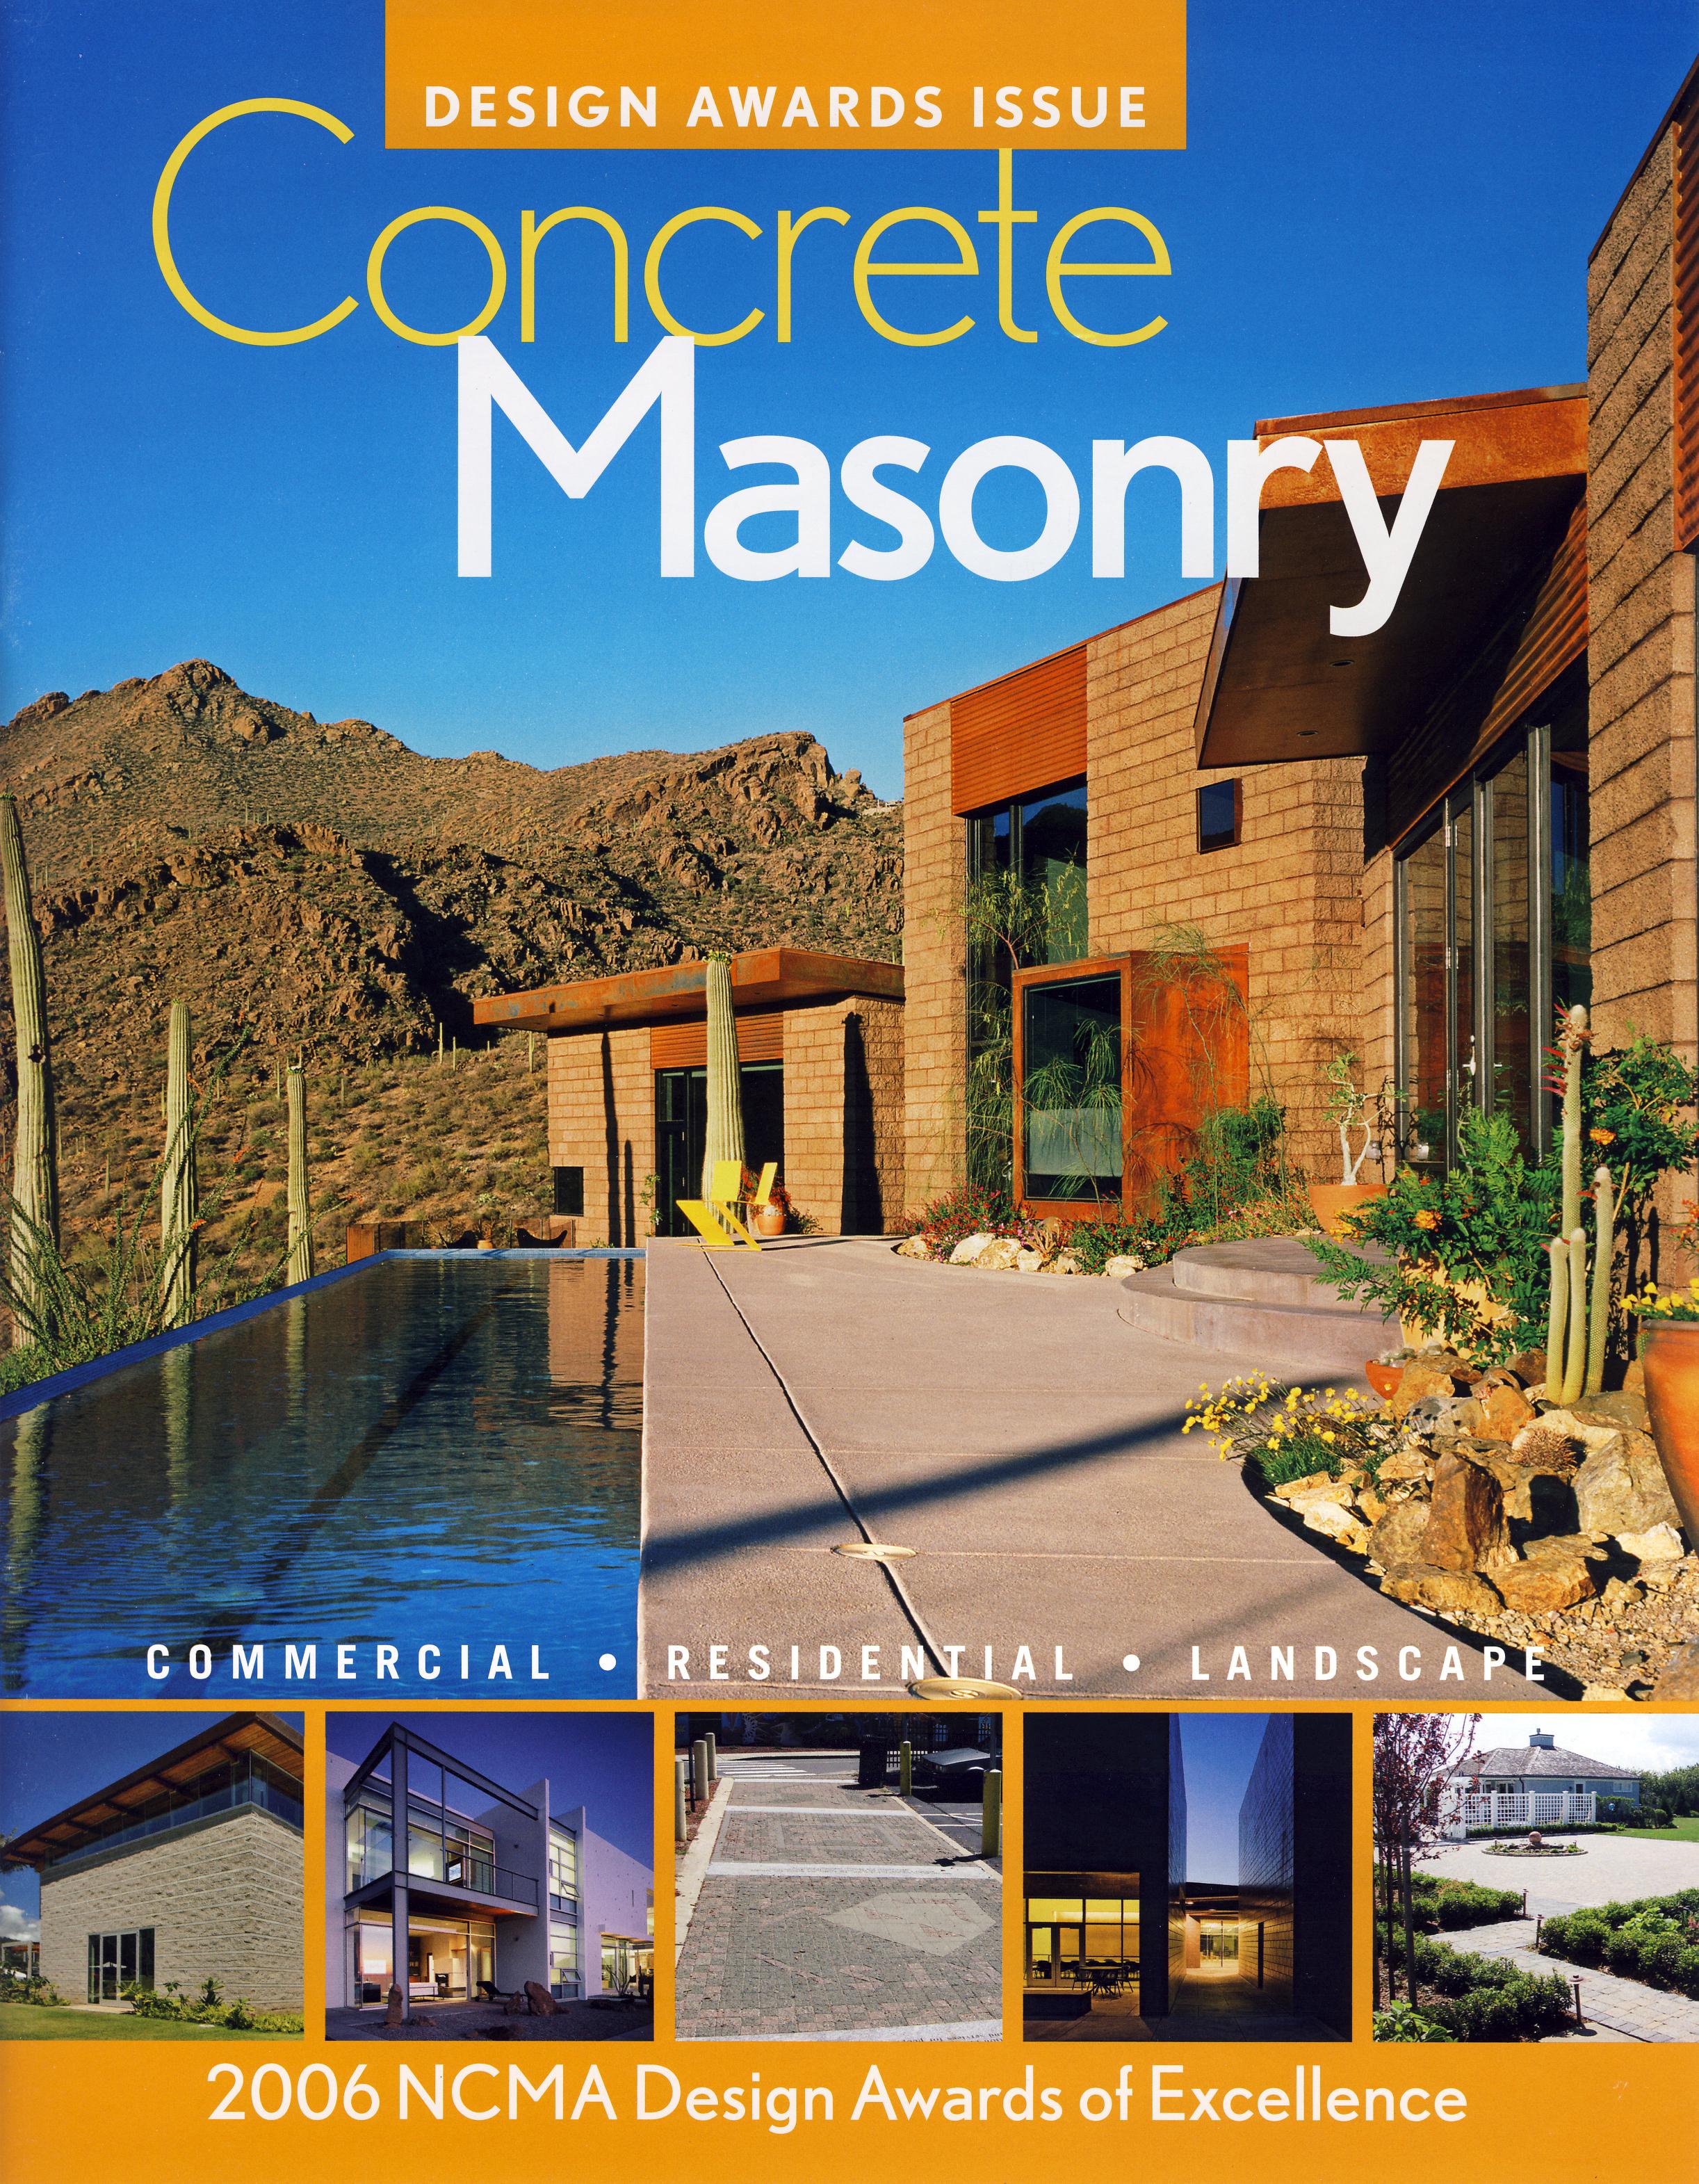 concrete masonry design awards issue 2006.jpg